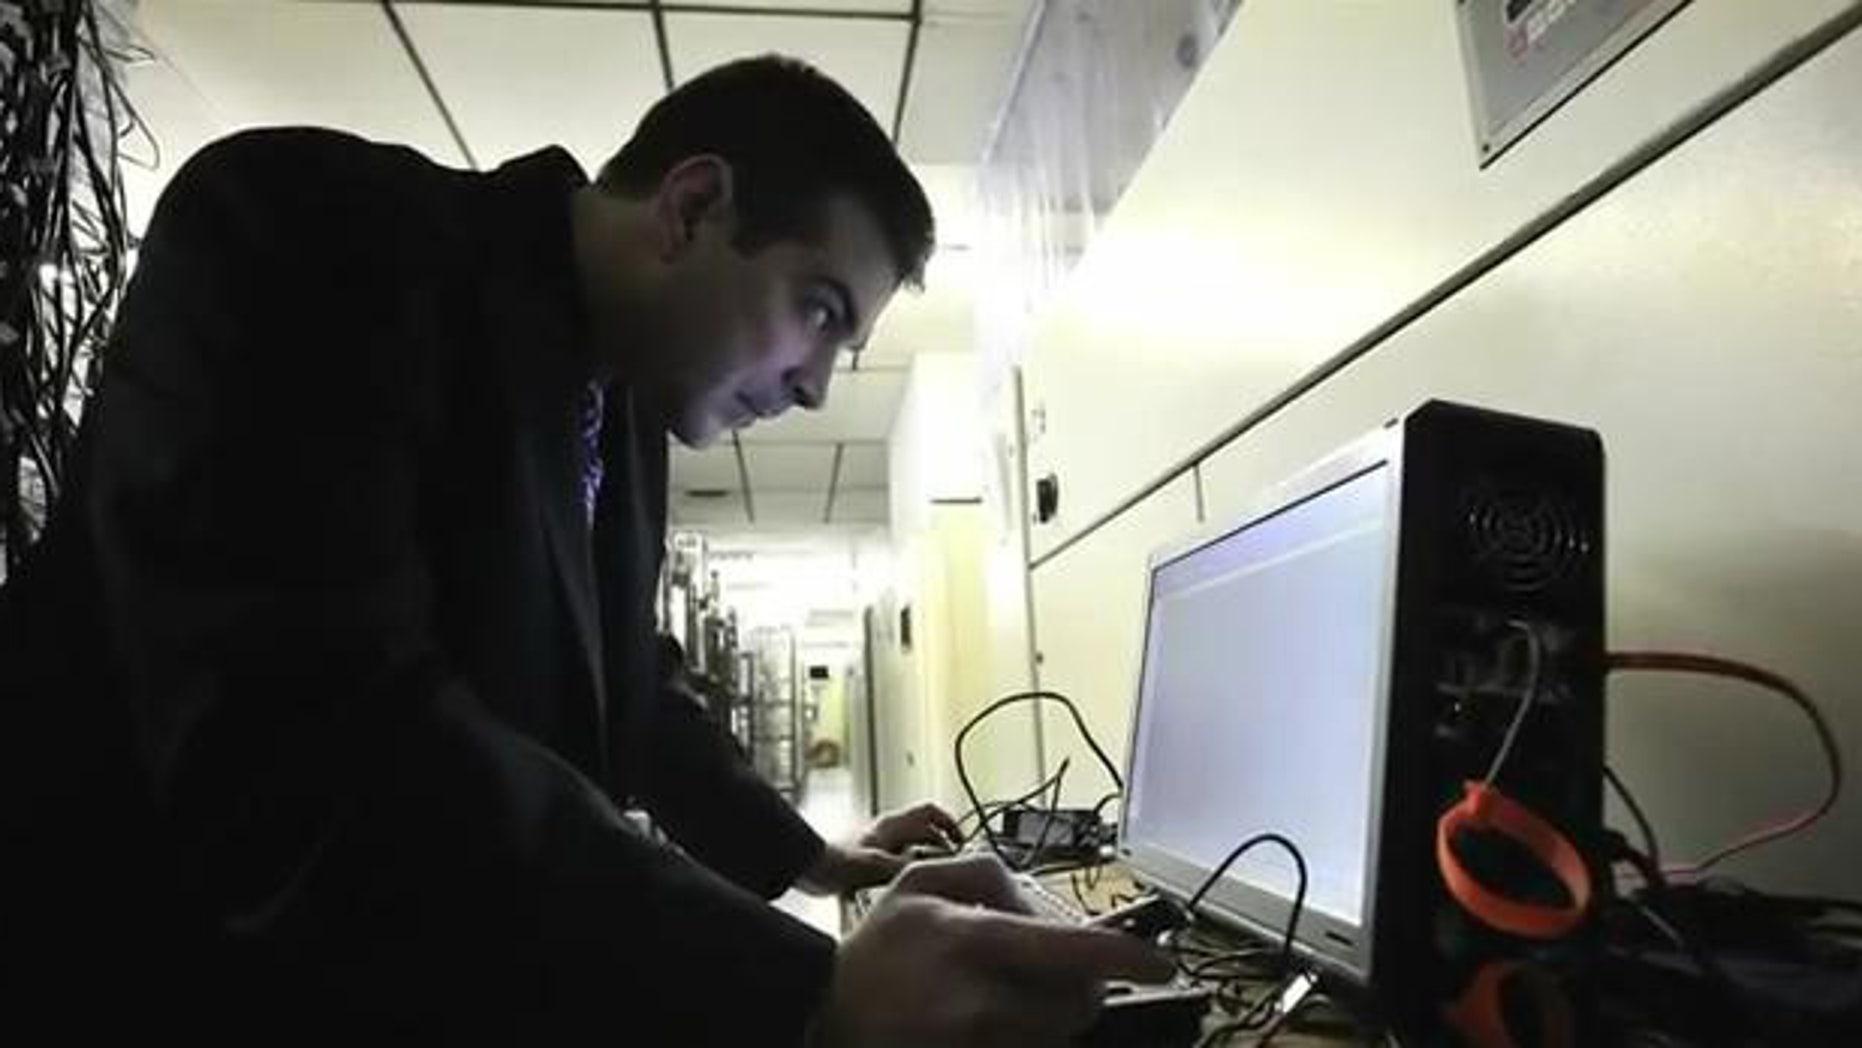 March 23, 2012: Digital forensic examiner Ashim Kapur disables a computer running the Zeus botnet in Scranton, PA.